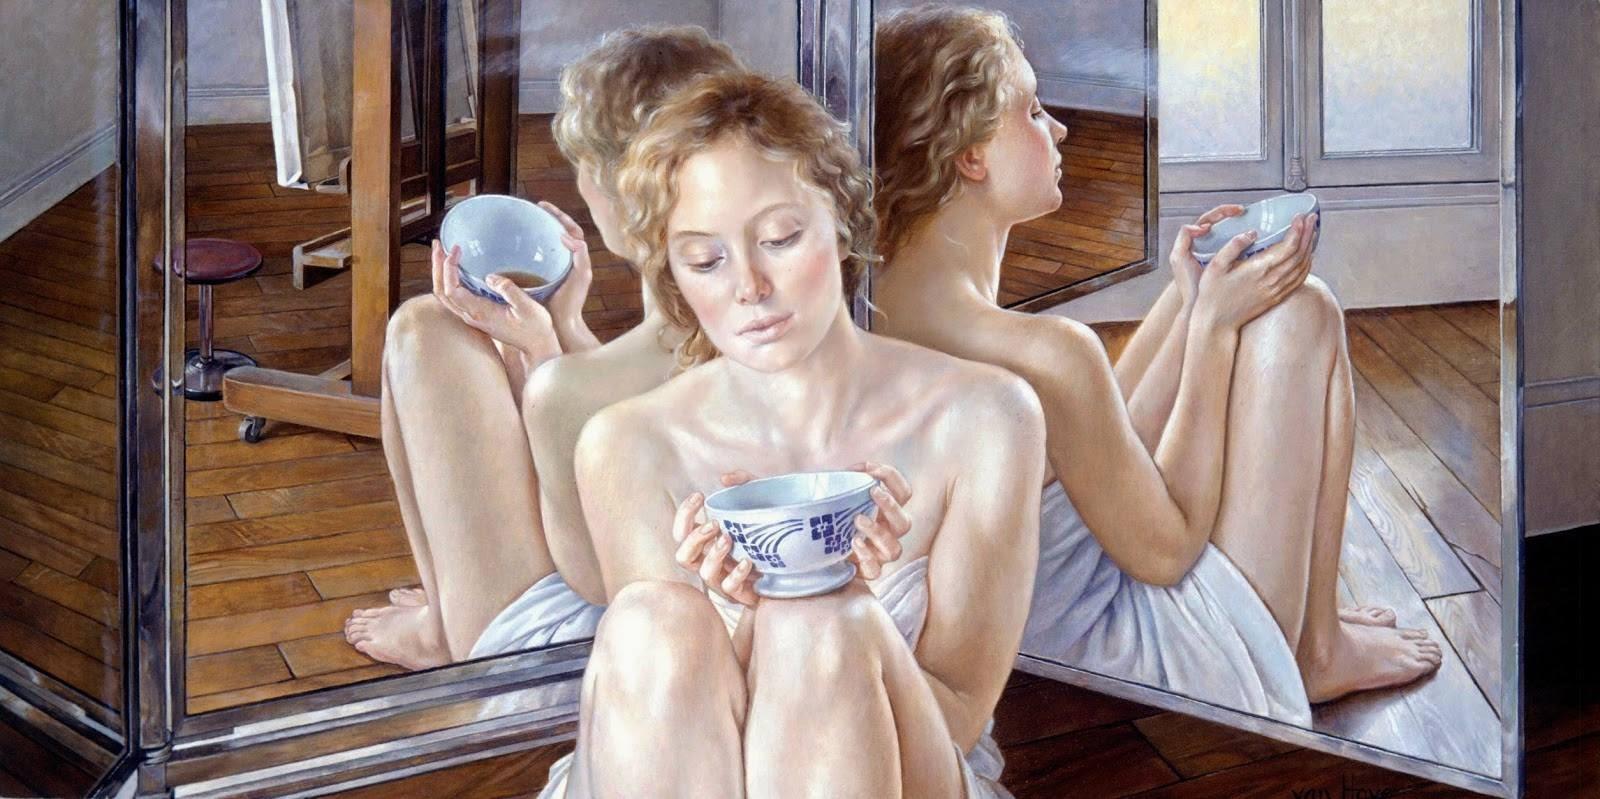 Francine Van Hove (French, 1942)   Masterpieces   Tutt'Art@